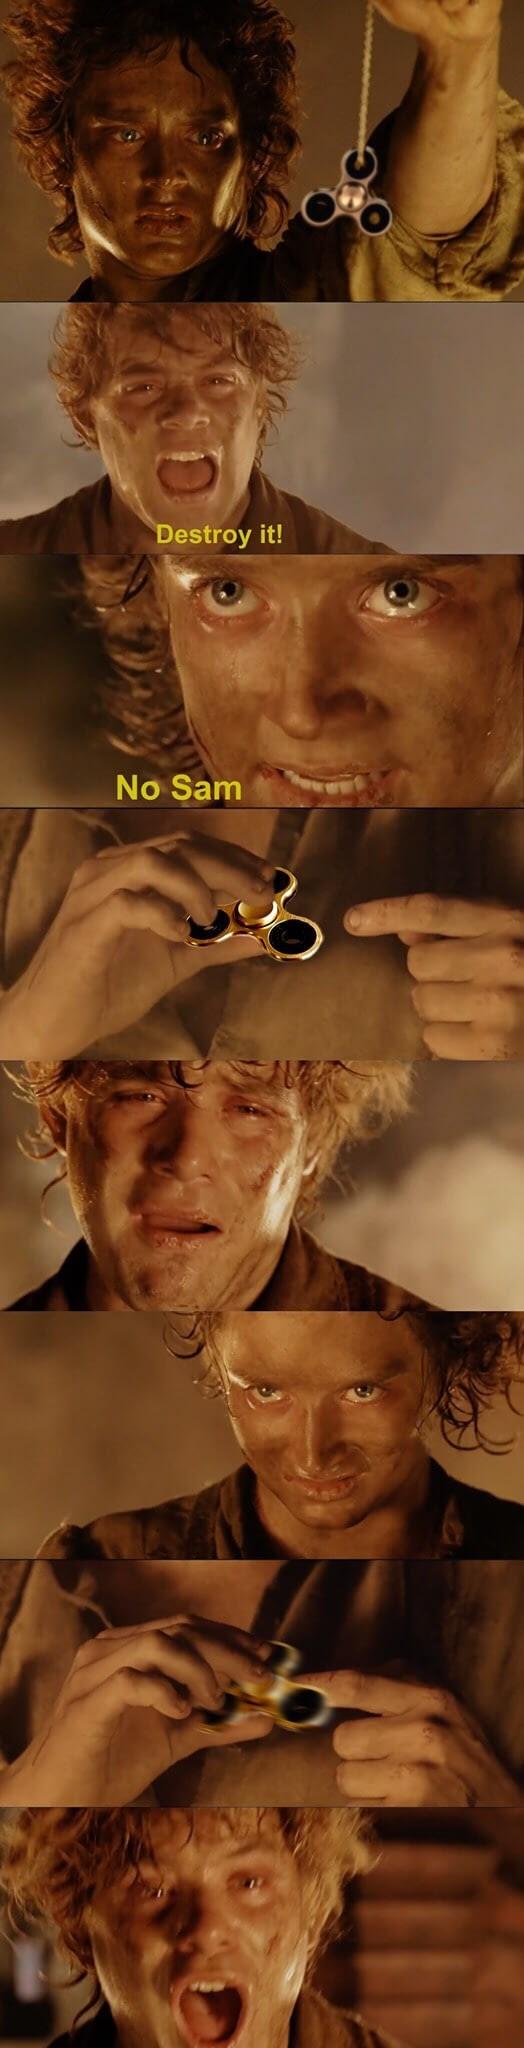 Human - Destroy it! No Sam